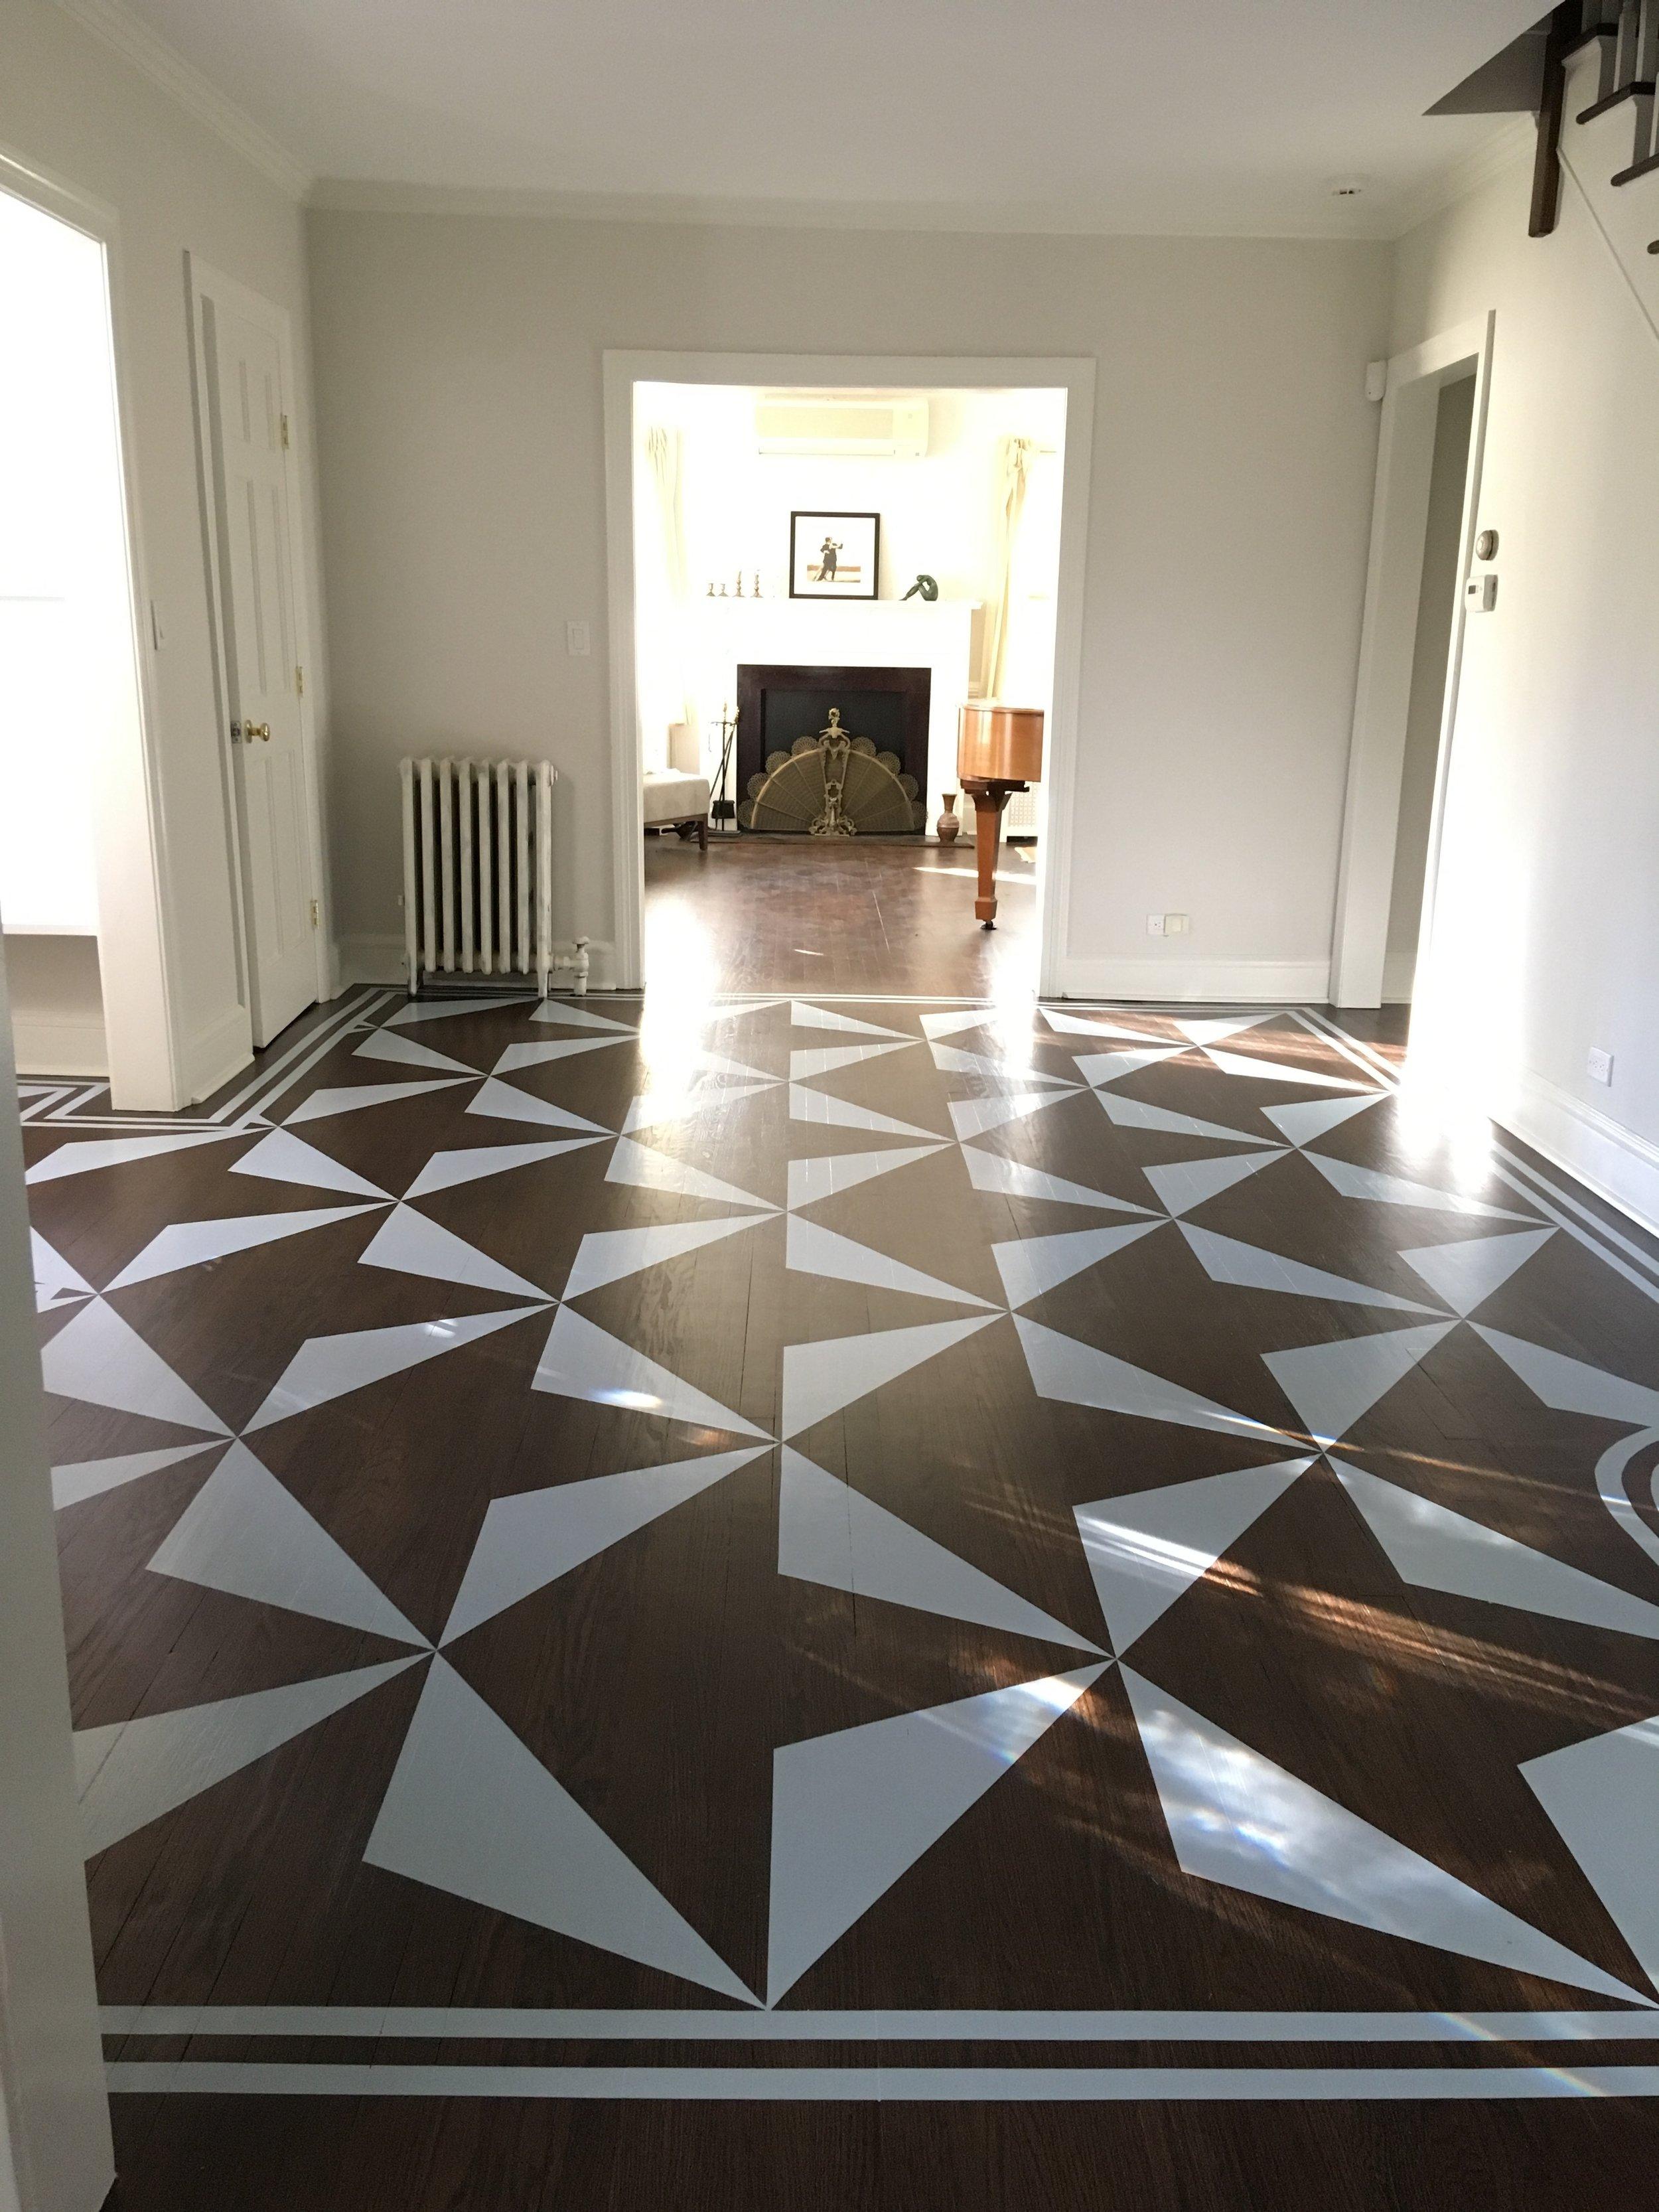 Site Specific Floor Painting